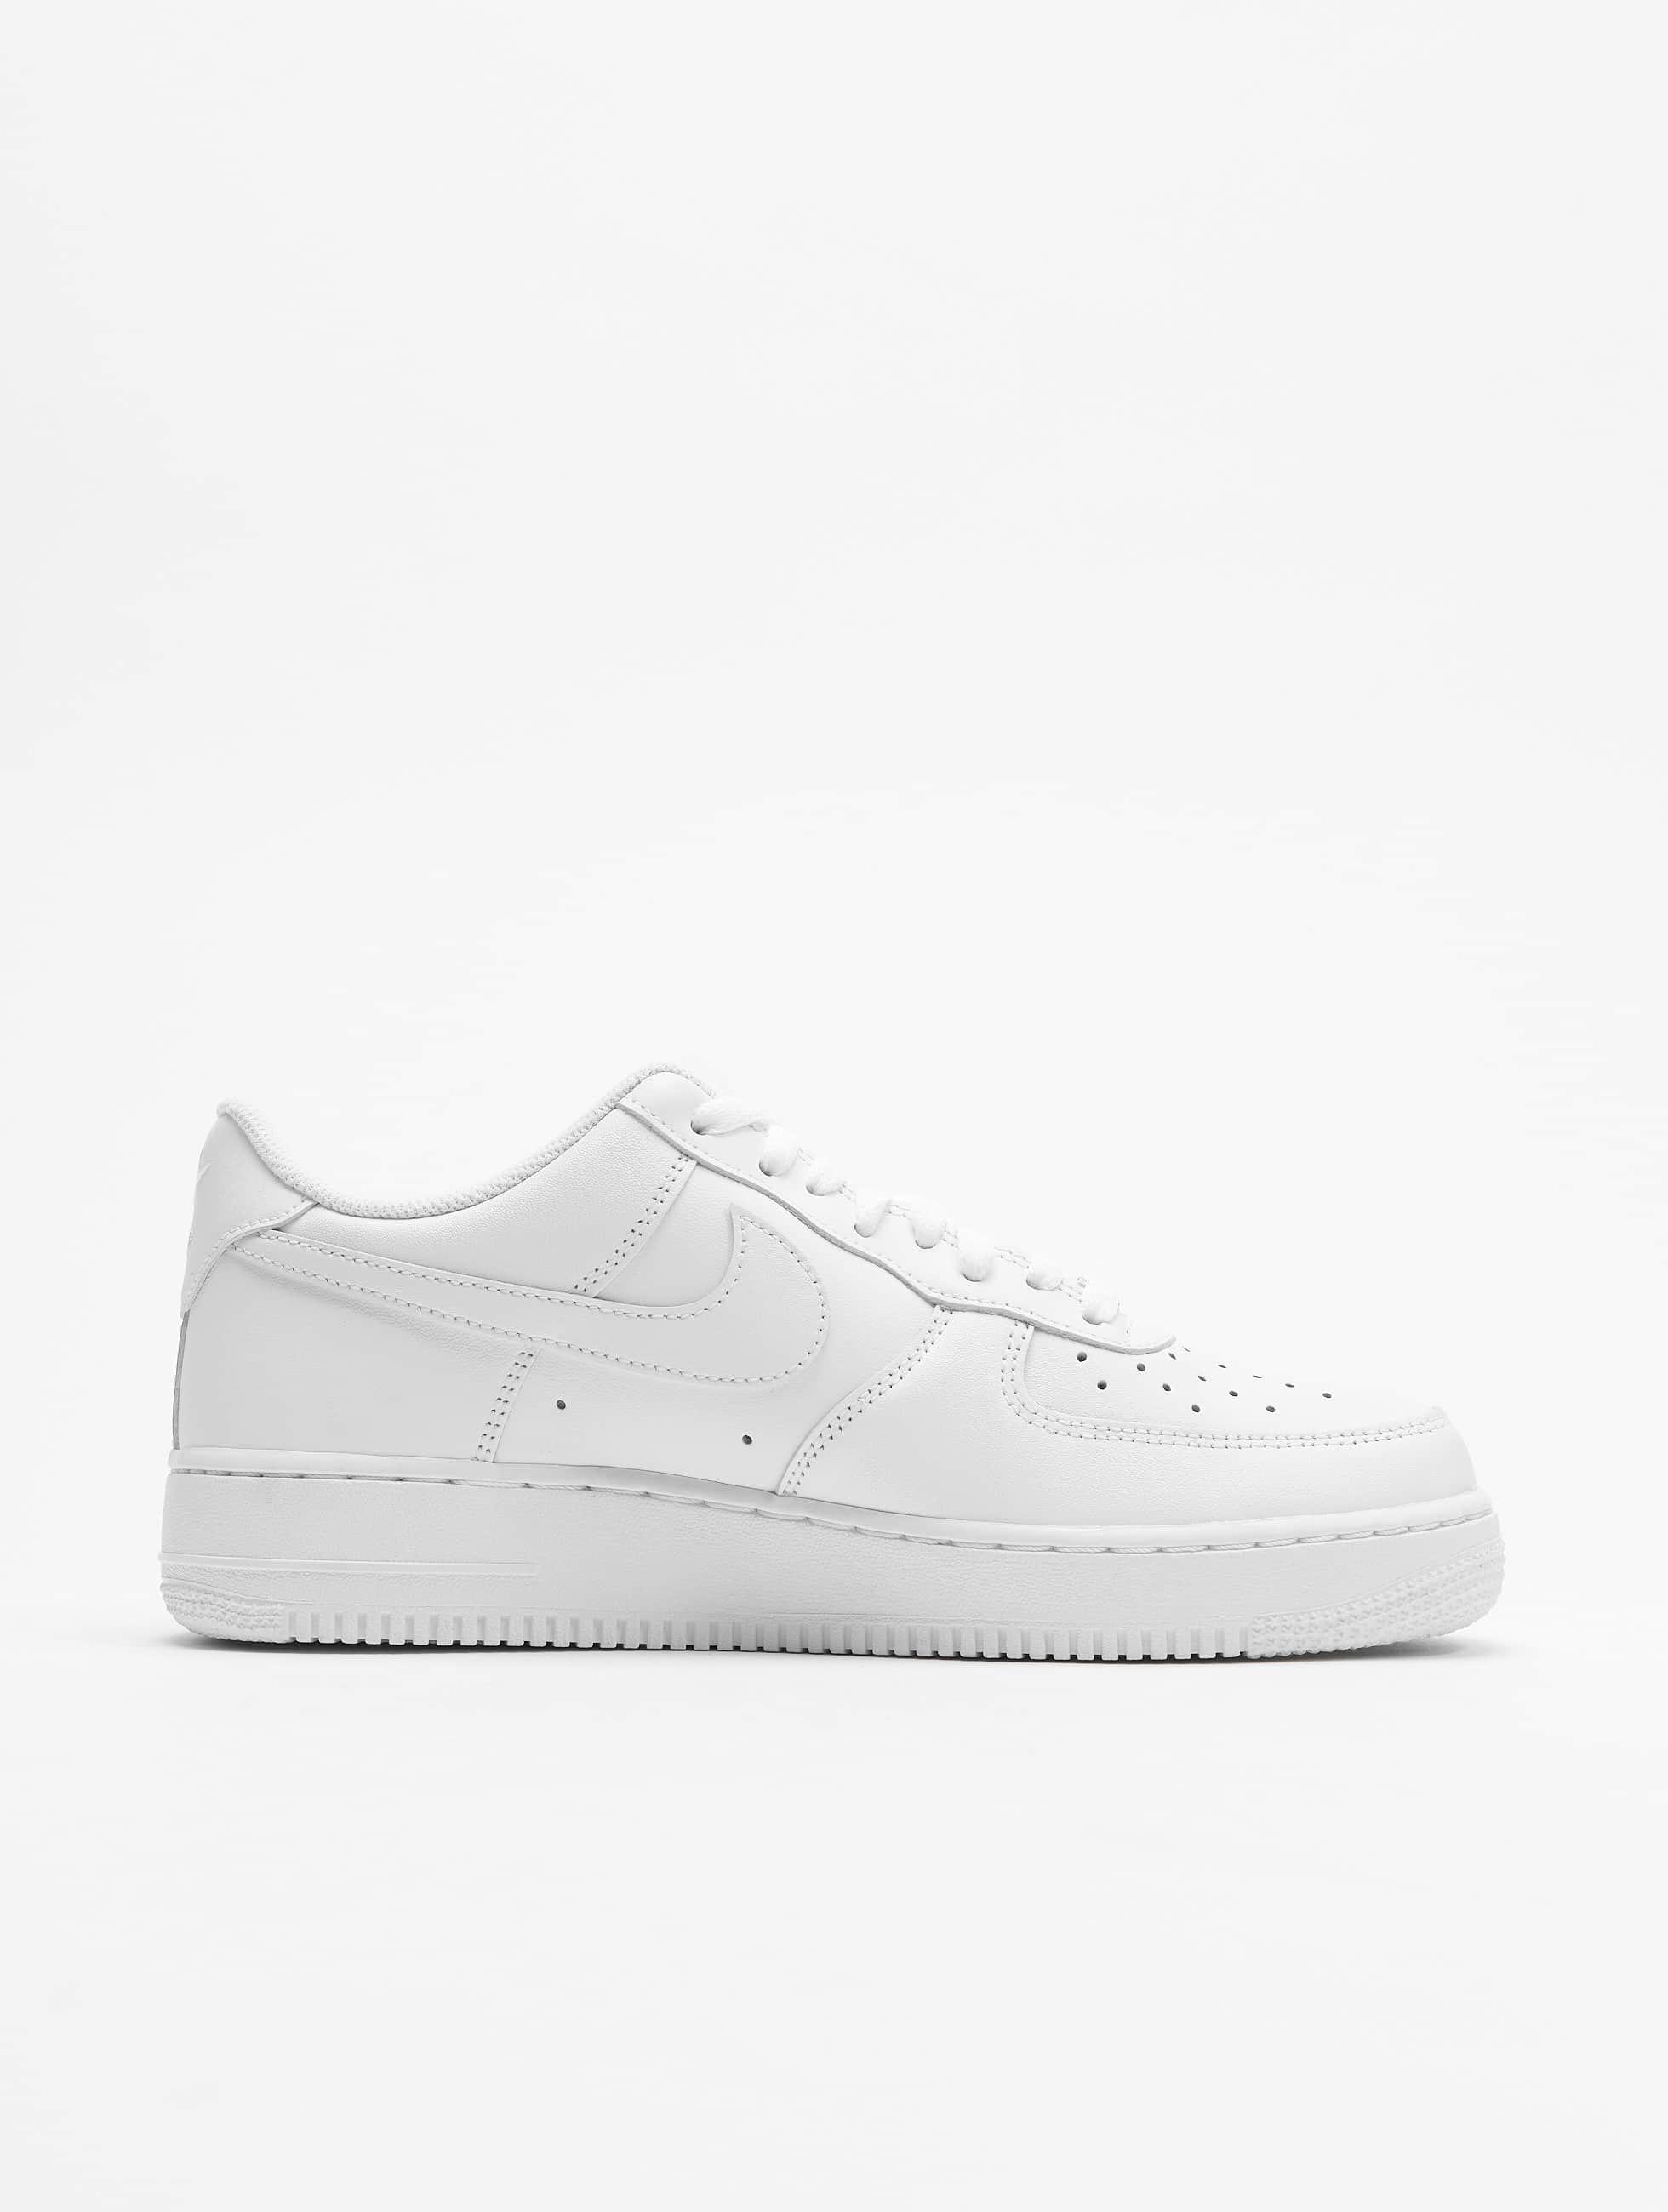 Nike Zapatillas de deporte Air Force 1 '07 Basketball Shoes blanco